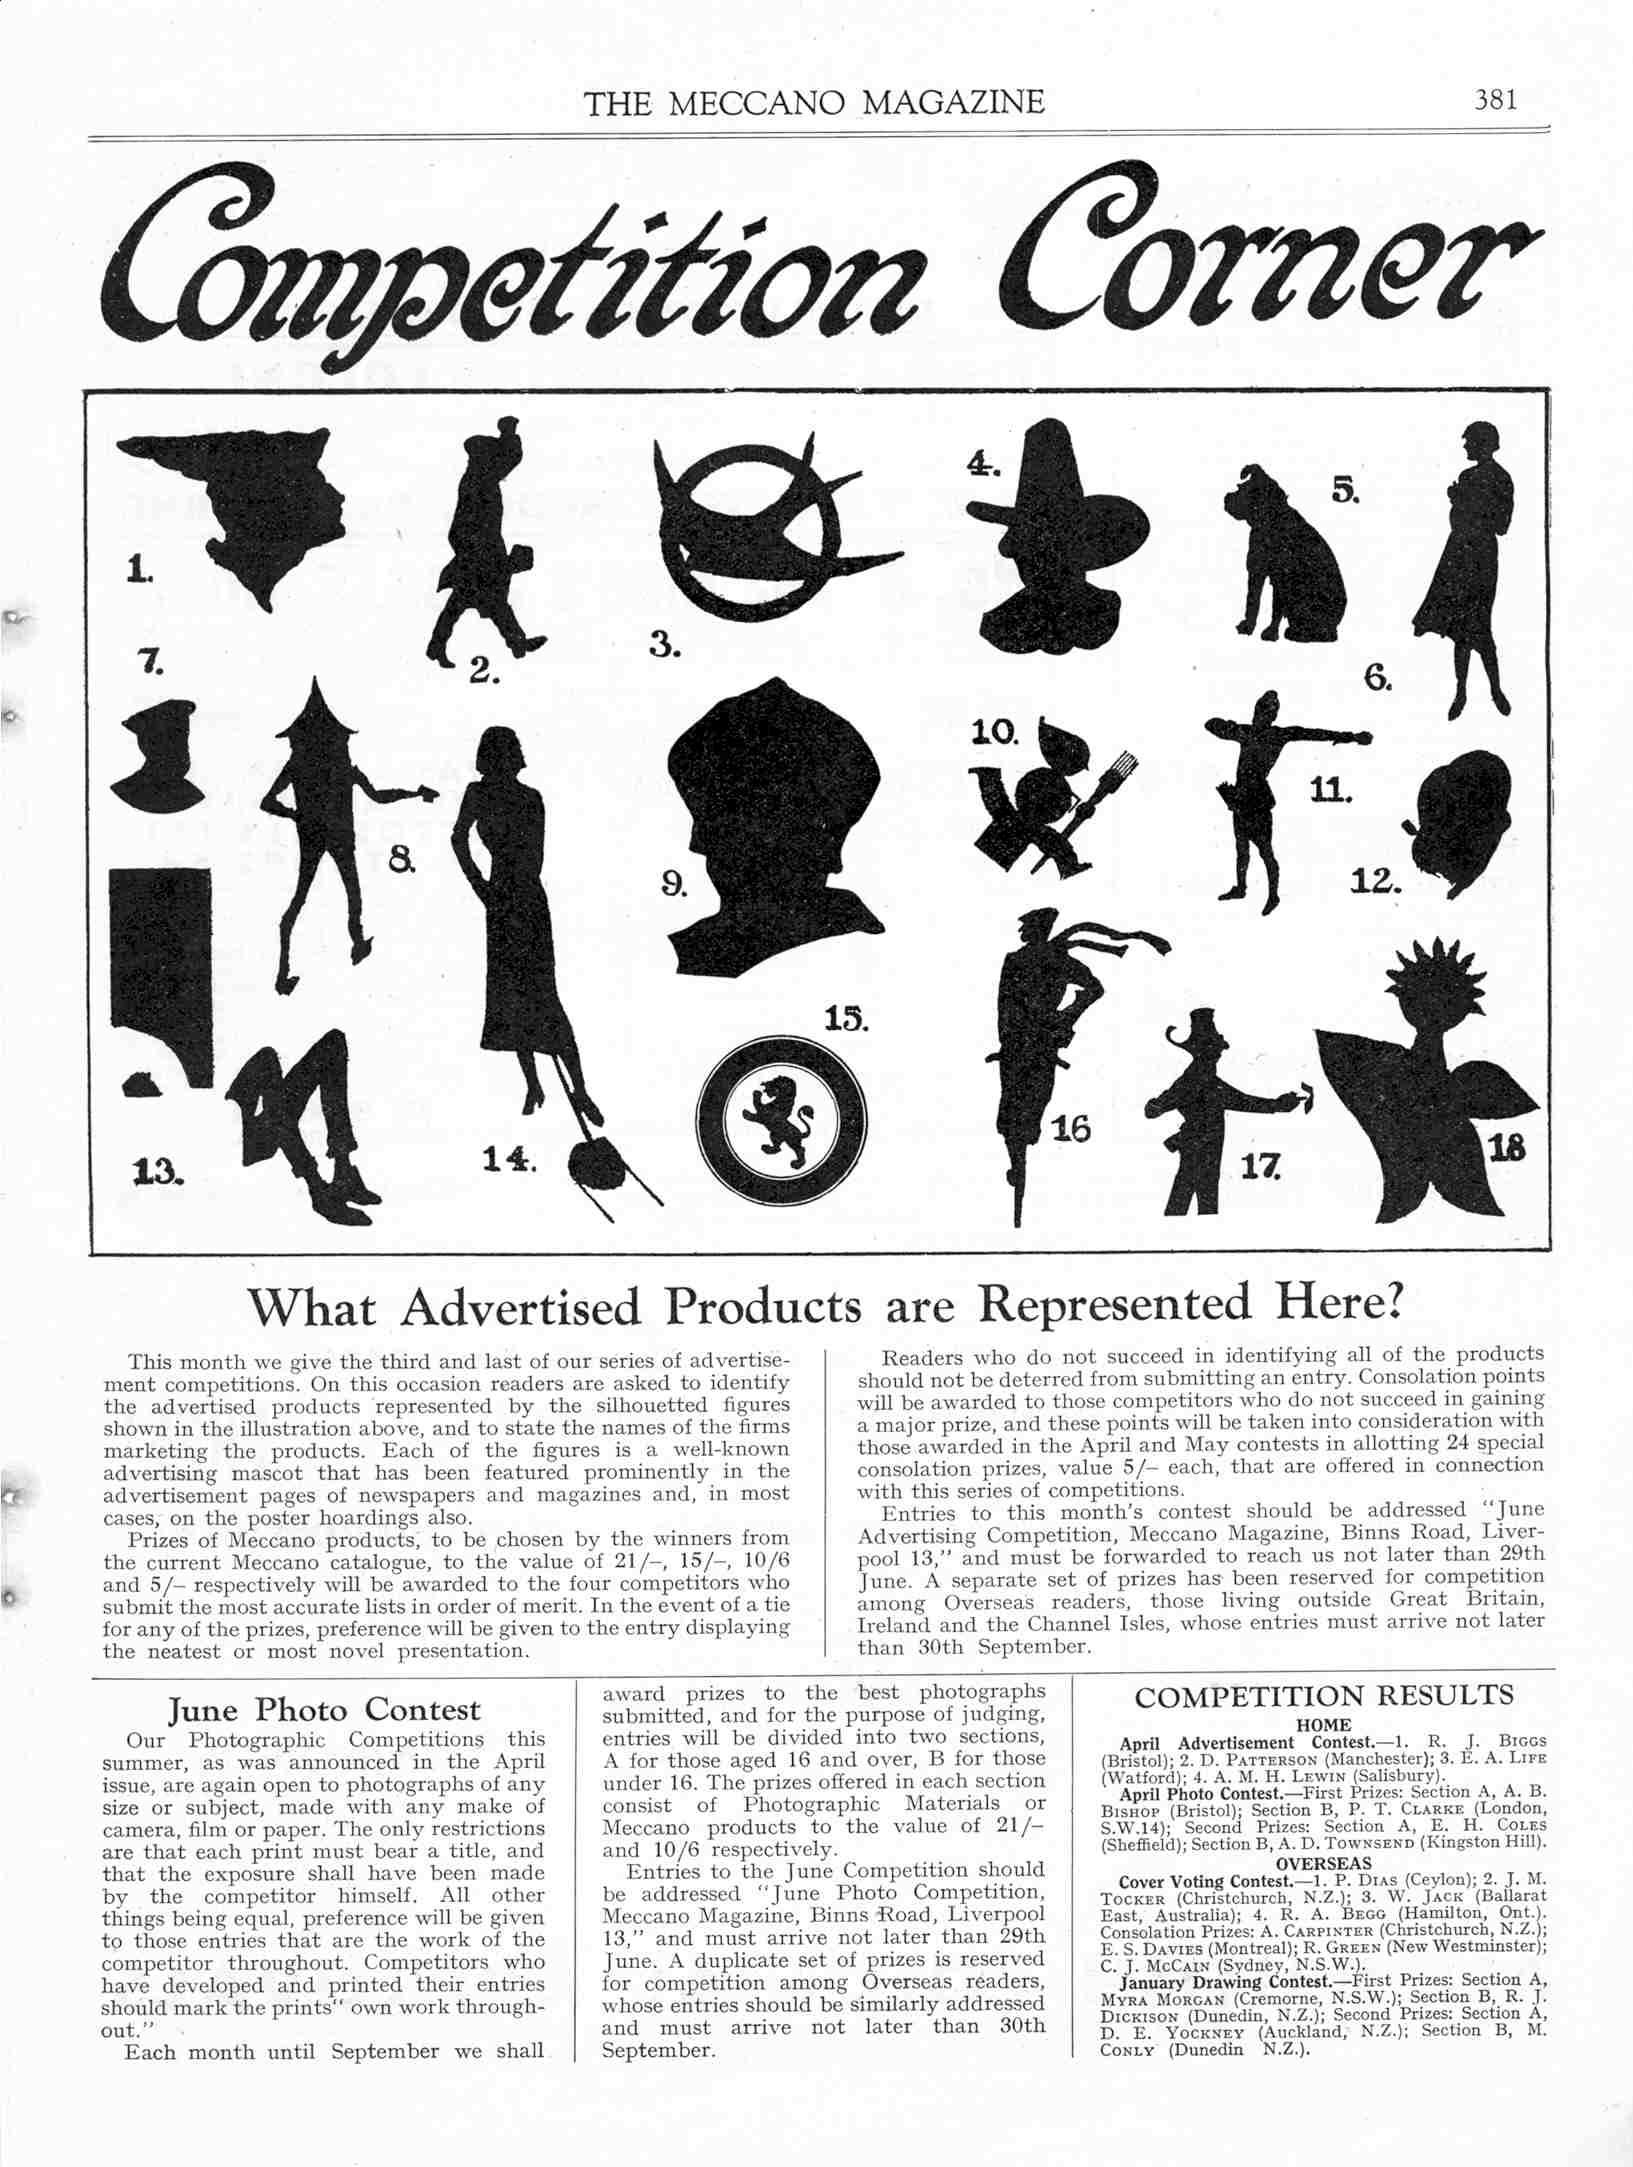 UK Meccano Magazine June 1935 Page 381